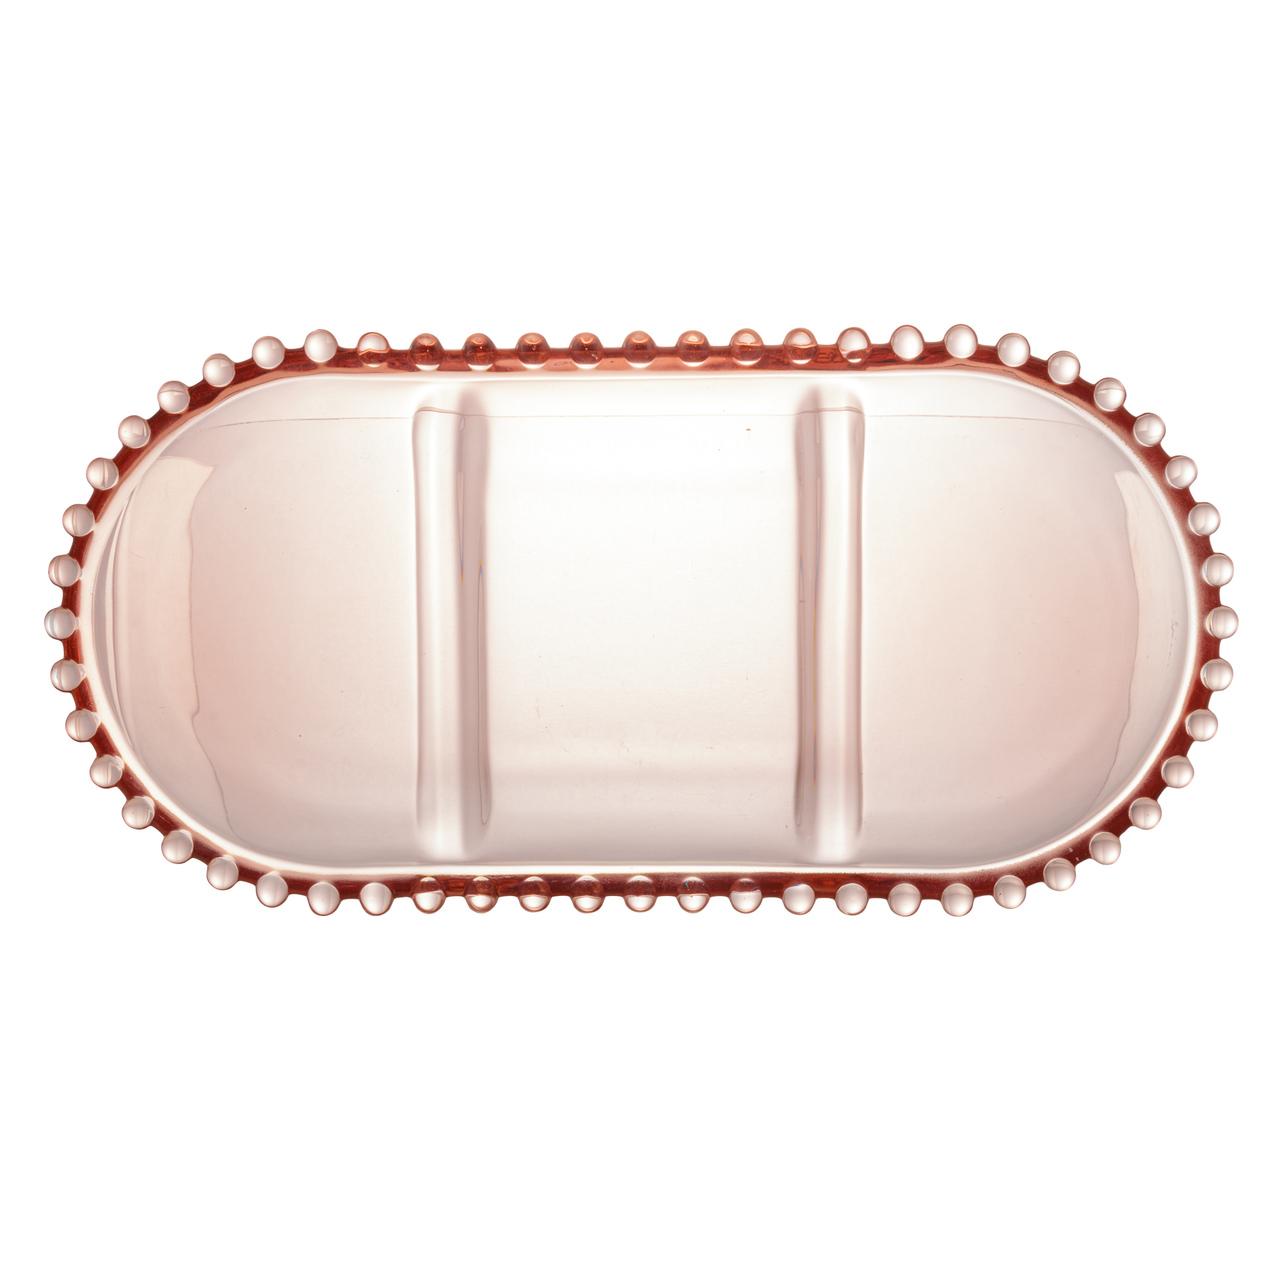 Petisqueira 30 cm de cristal com 3 divisões oval Pearl Wolff - 28465